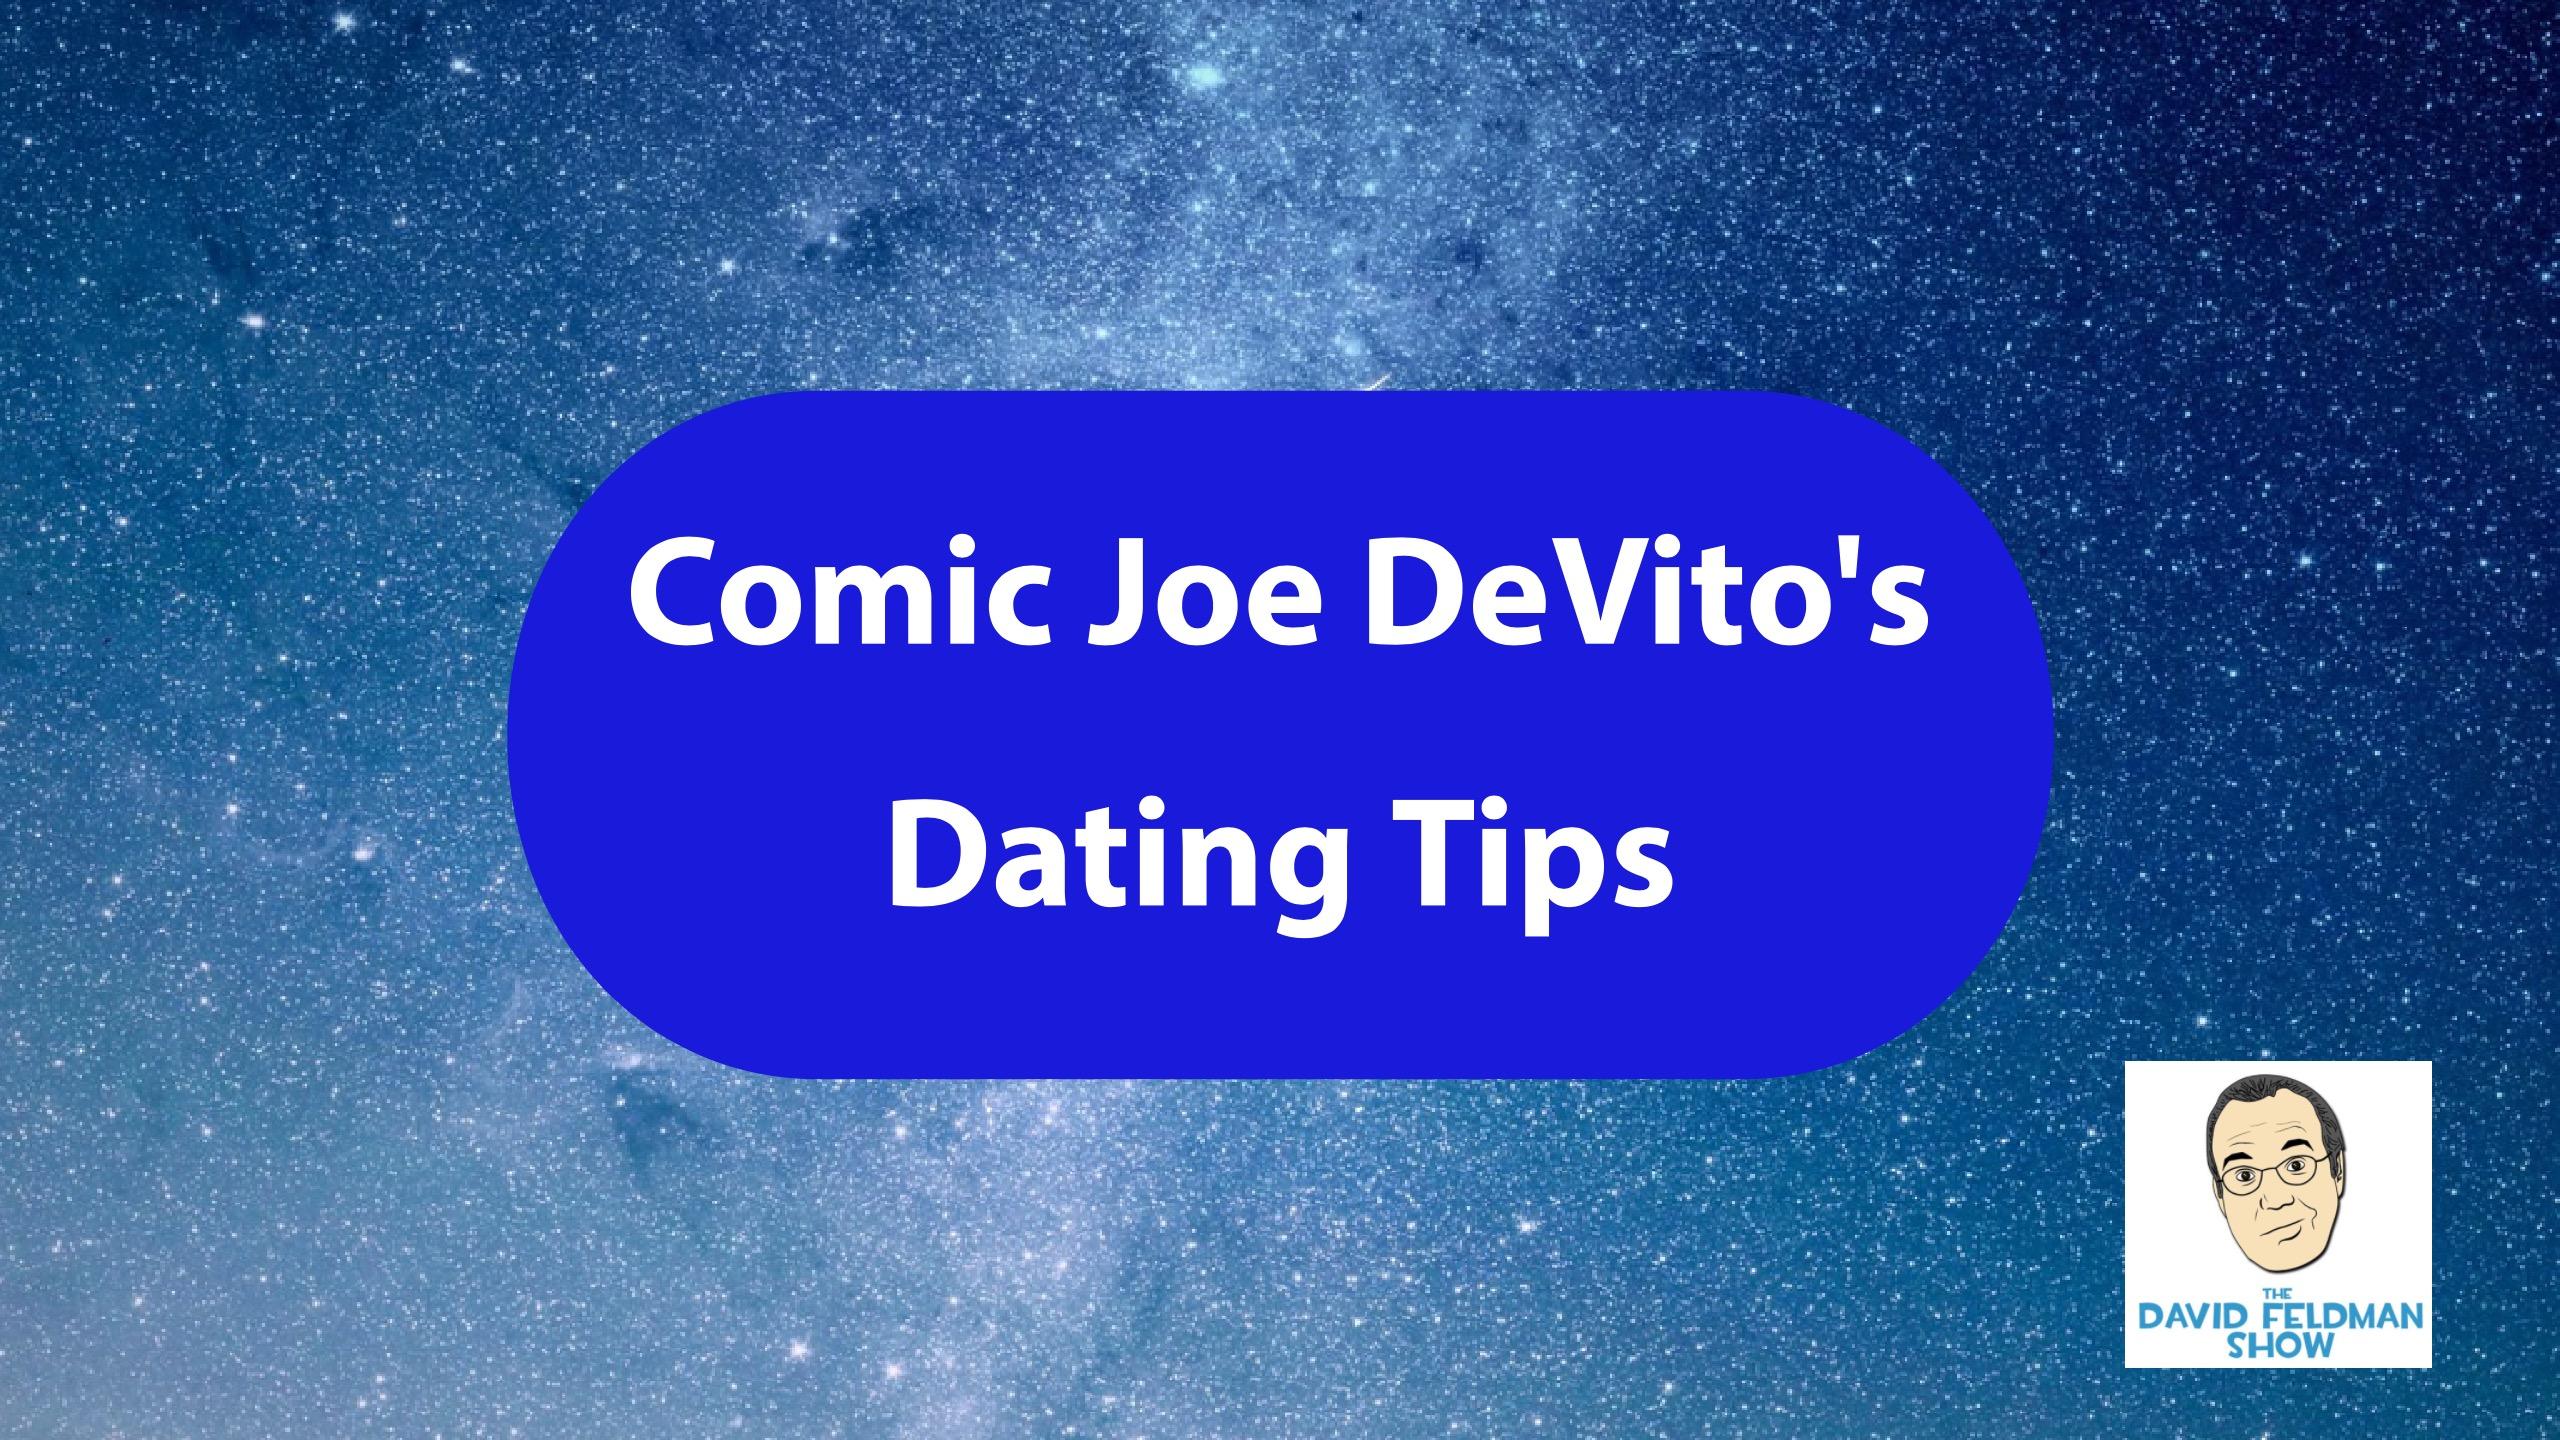 Joe Devito's dating tips